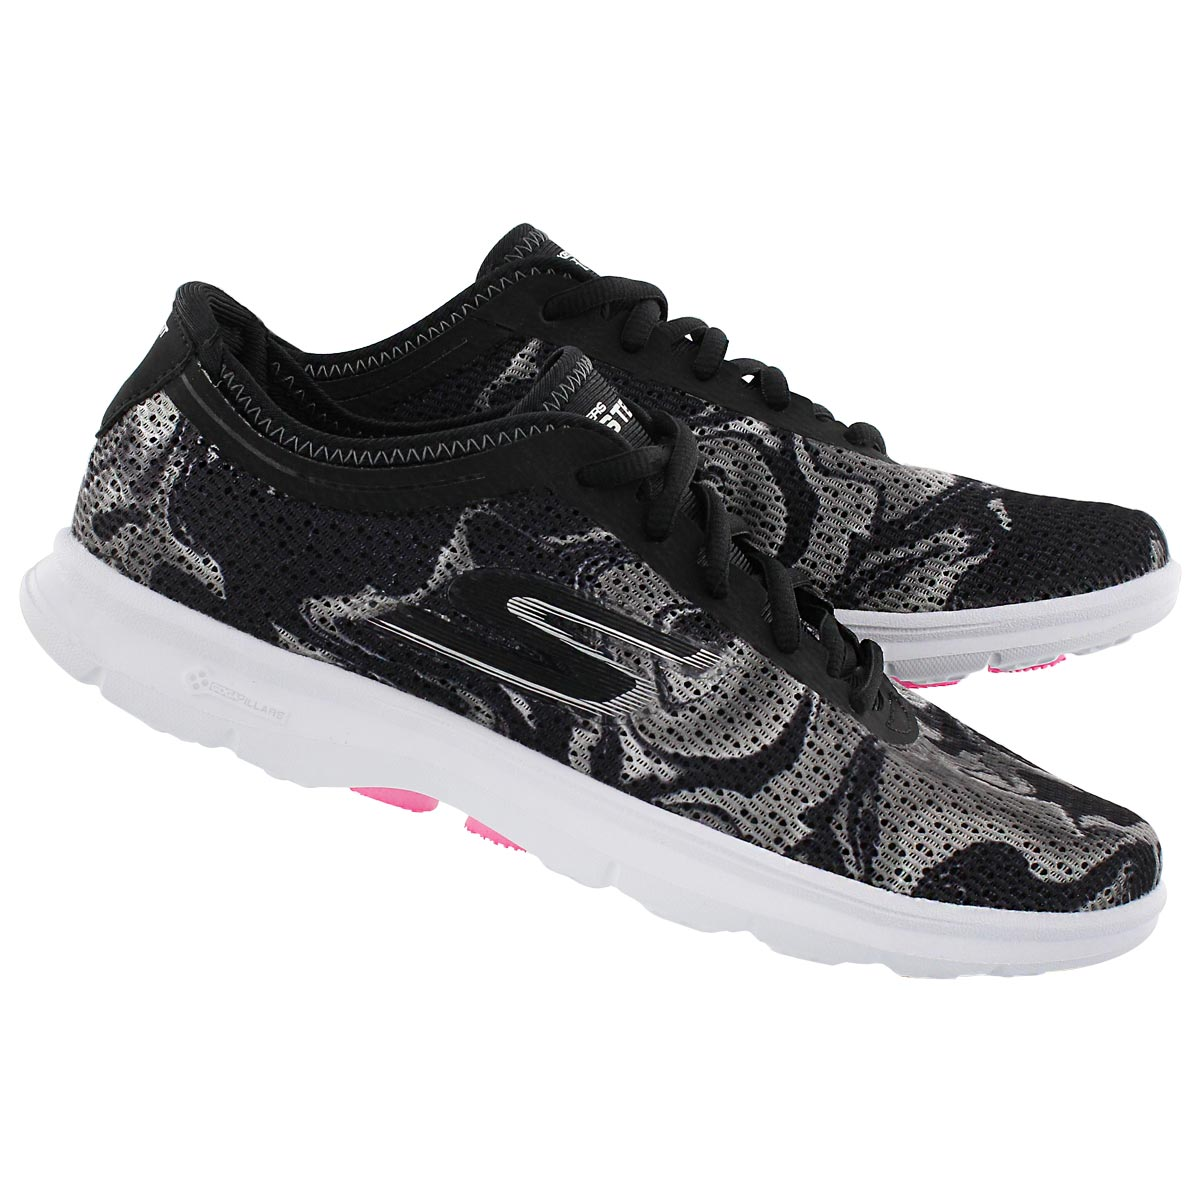 Lds Daze blk/wht marble print sneaker